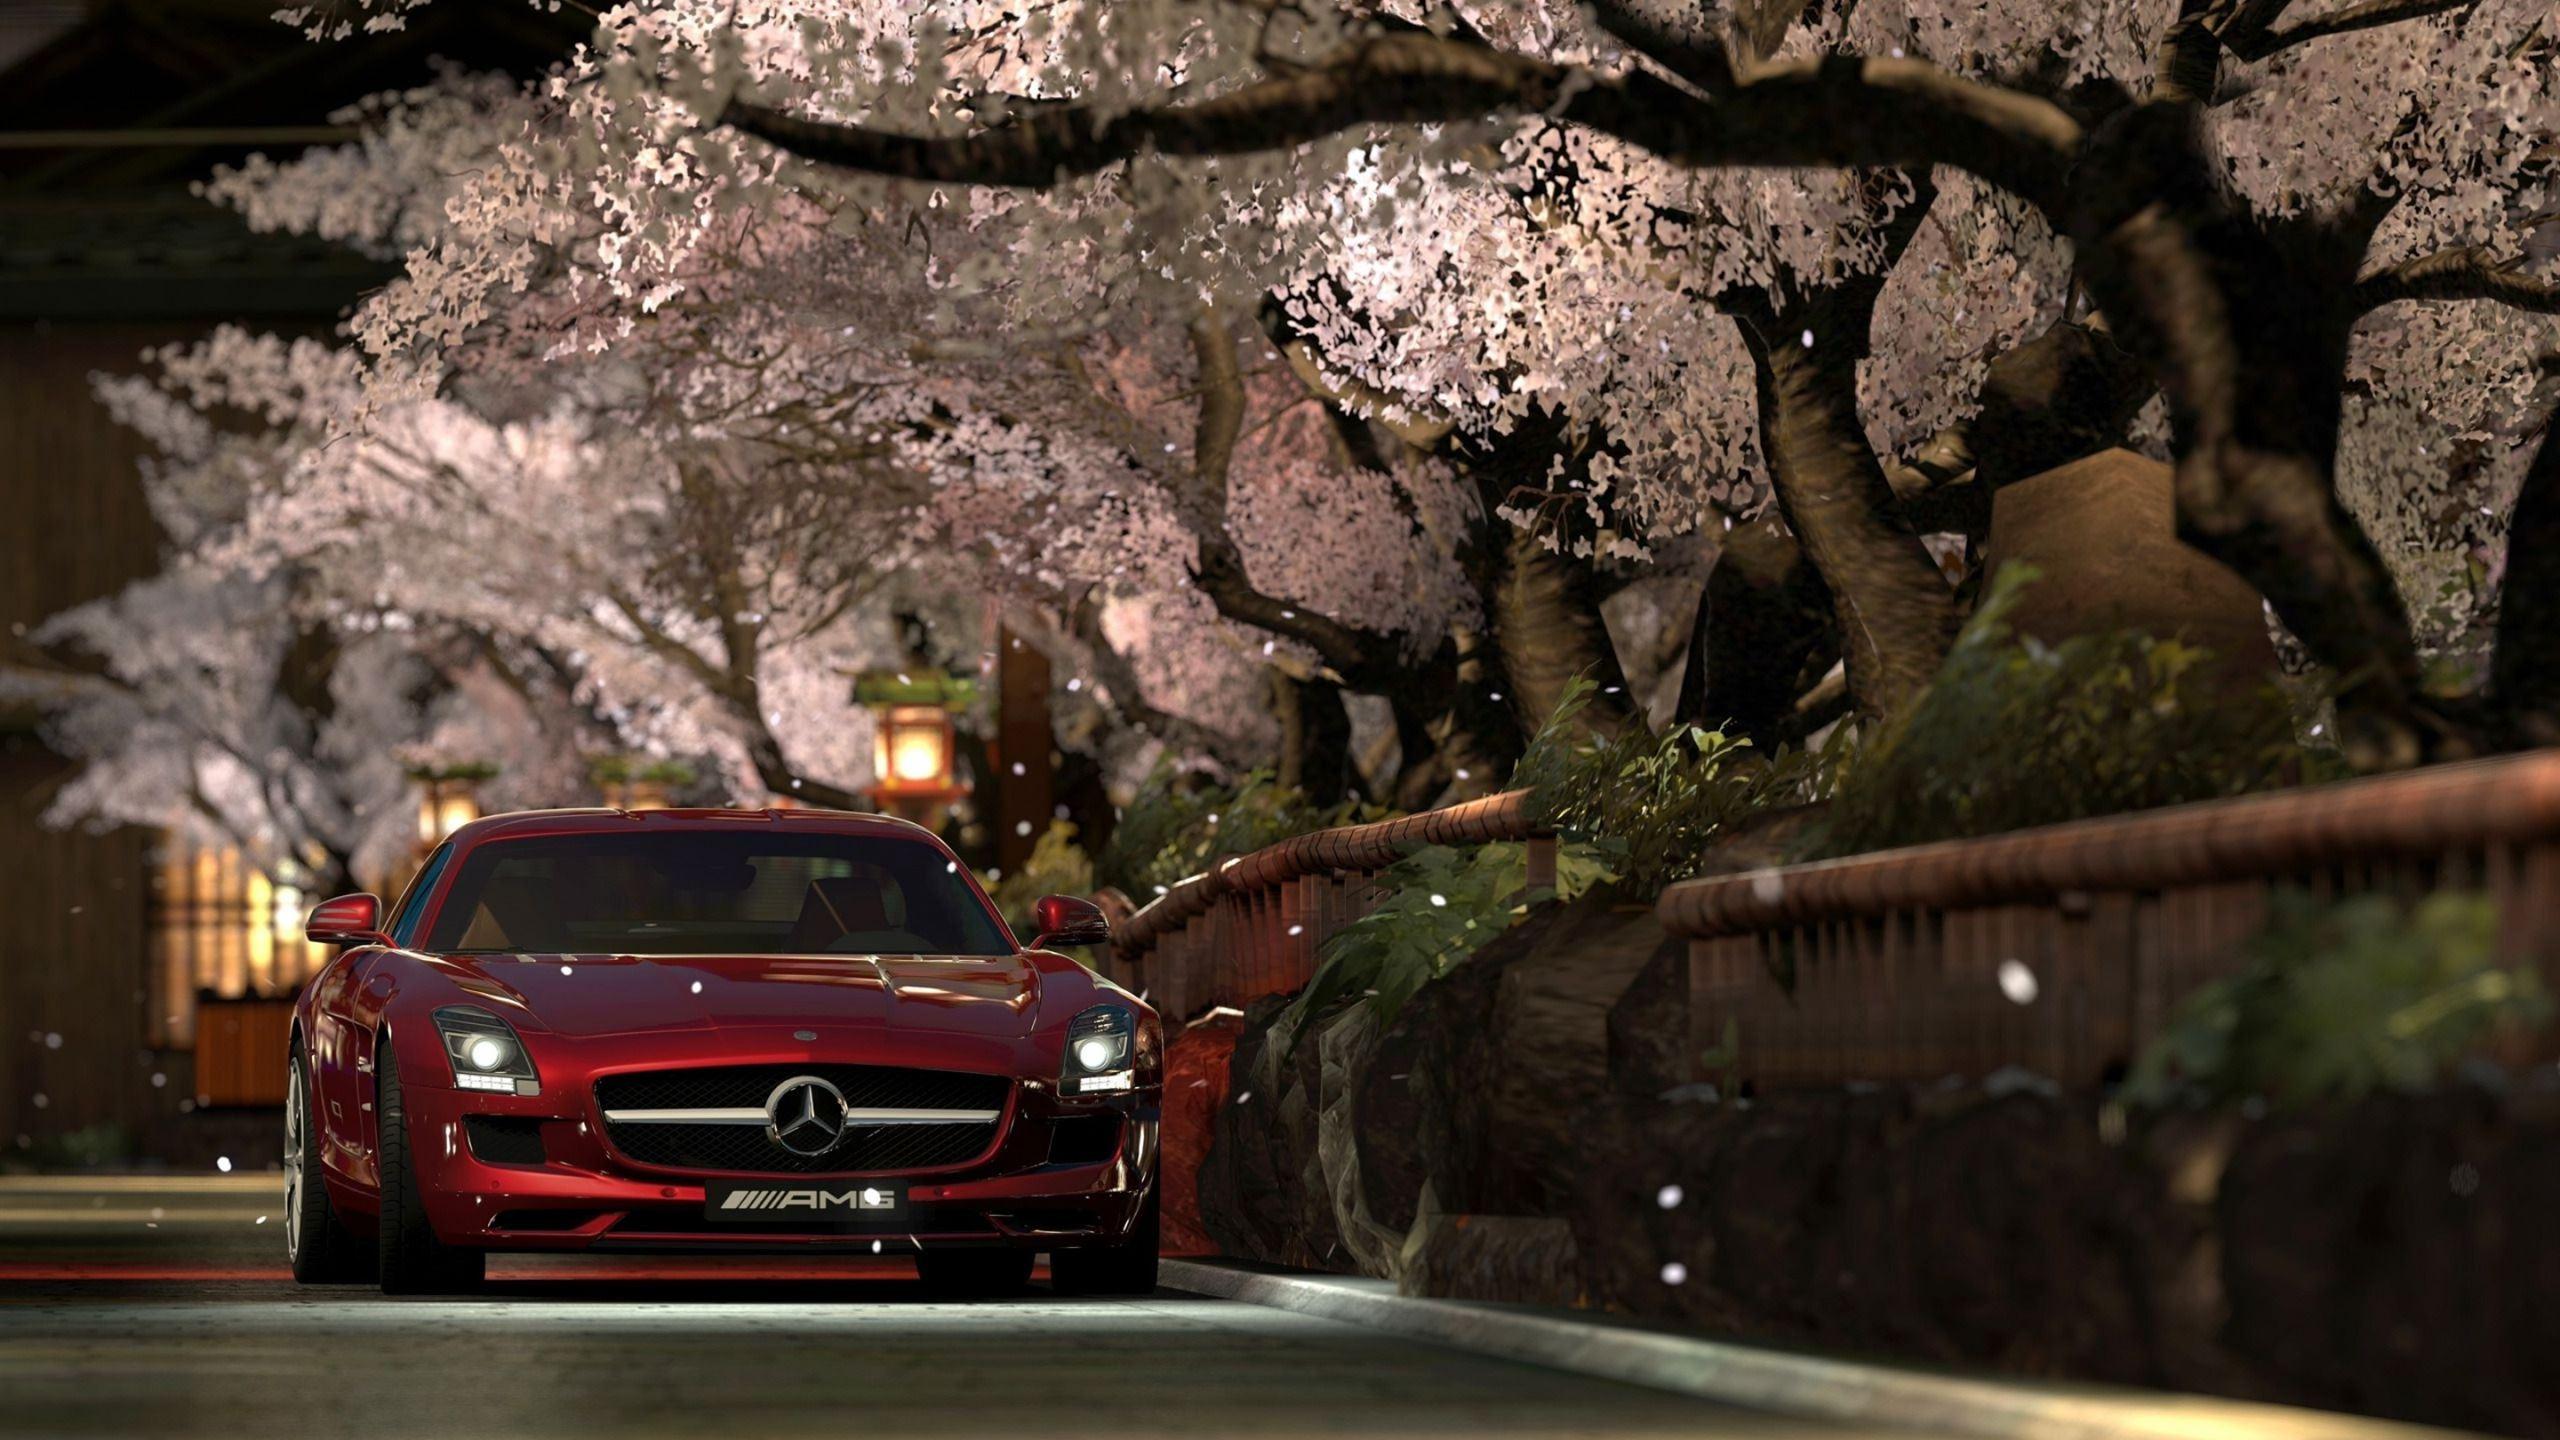 Mercedes Benz Sls Amg Red Night Mac Wallpaper Download Free Mac